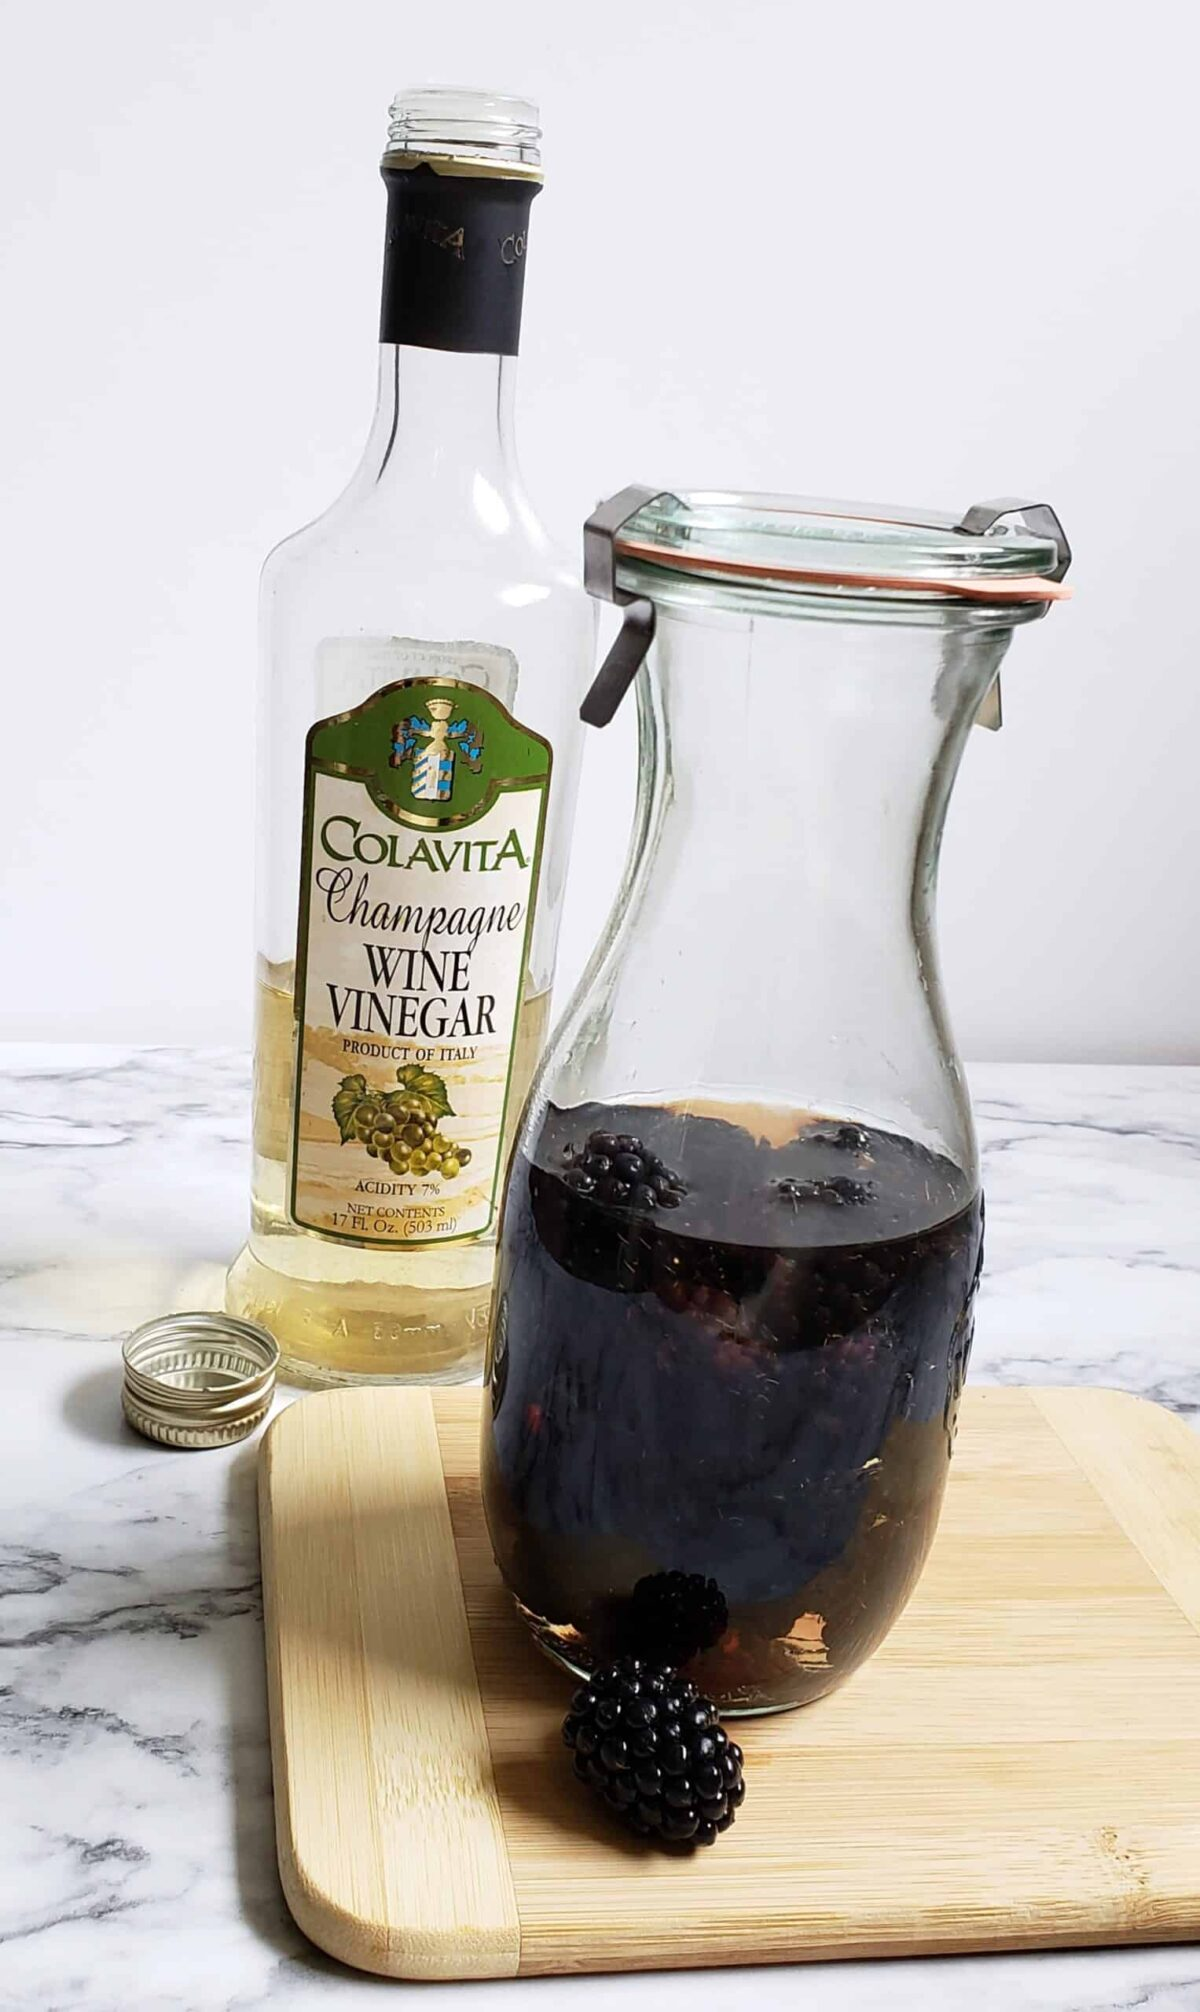 Weck jar of vinegar with blackberries in it. One berry on a cutting board. Champagne wine vinegar in bottle in background